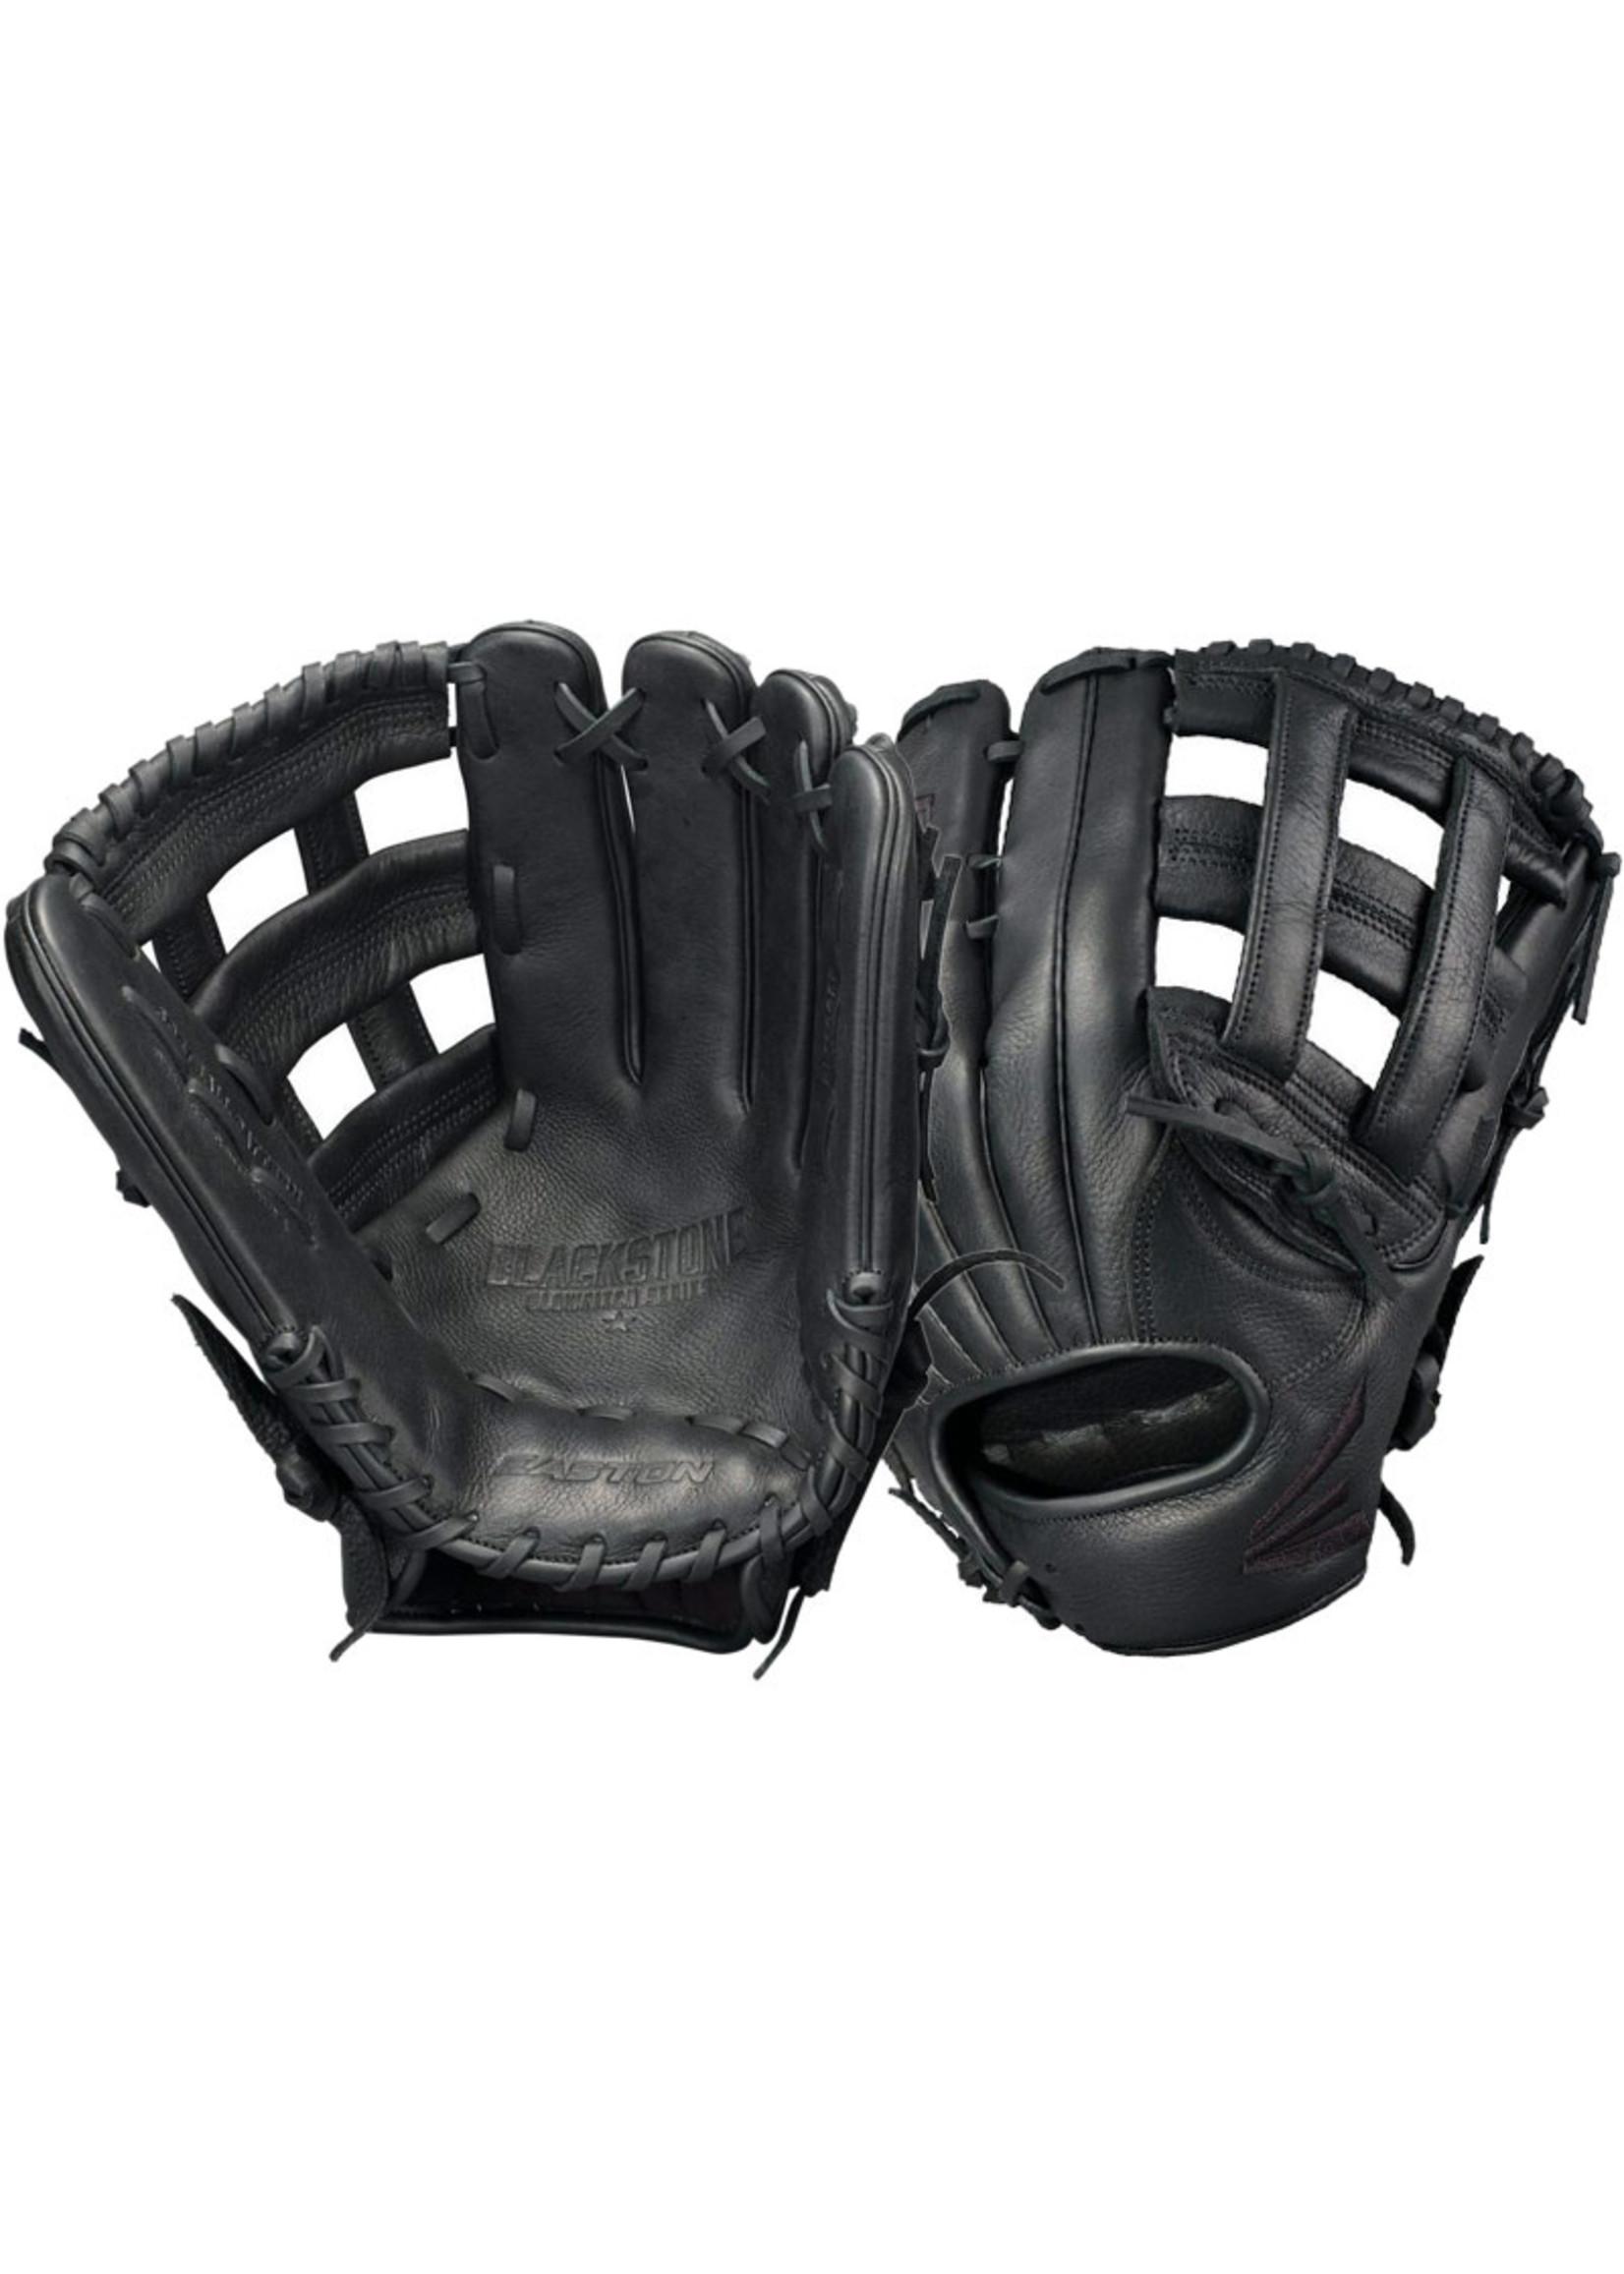 "Easton Baseball (Canada) EASTON BLACKSTONE SERIES 13"" SLOWPITCH GLOVE"